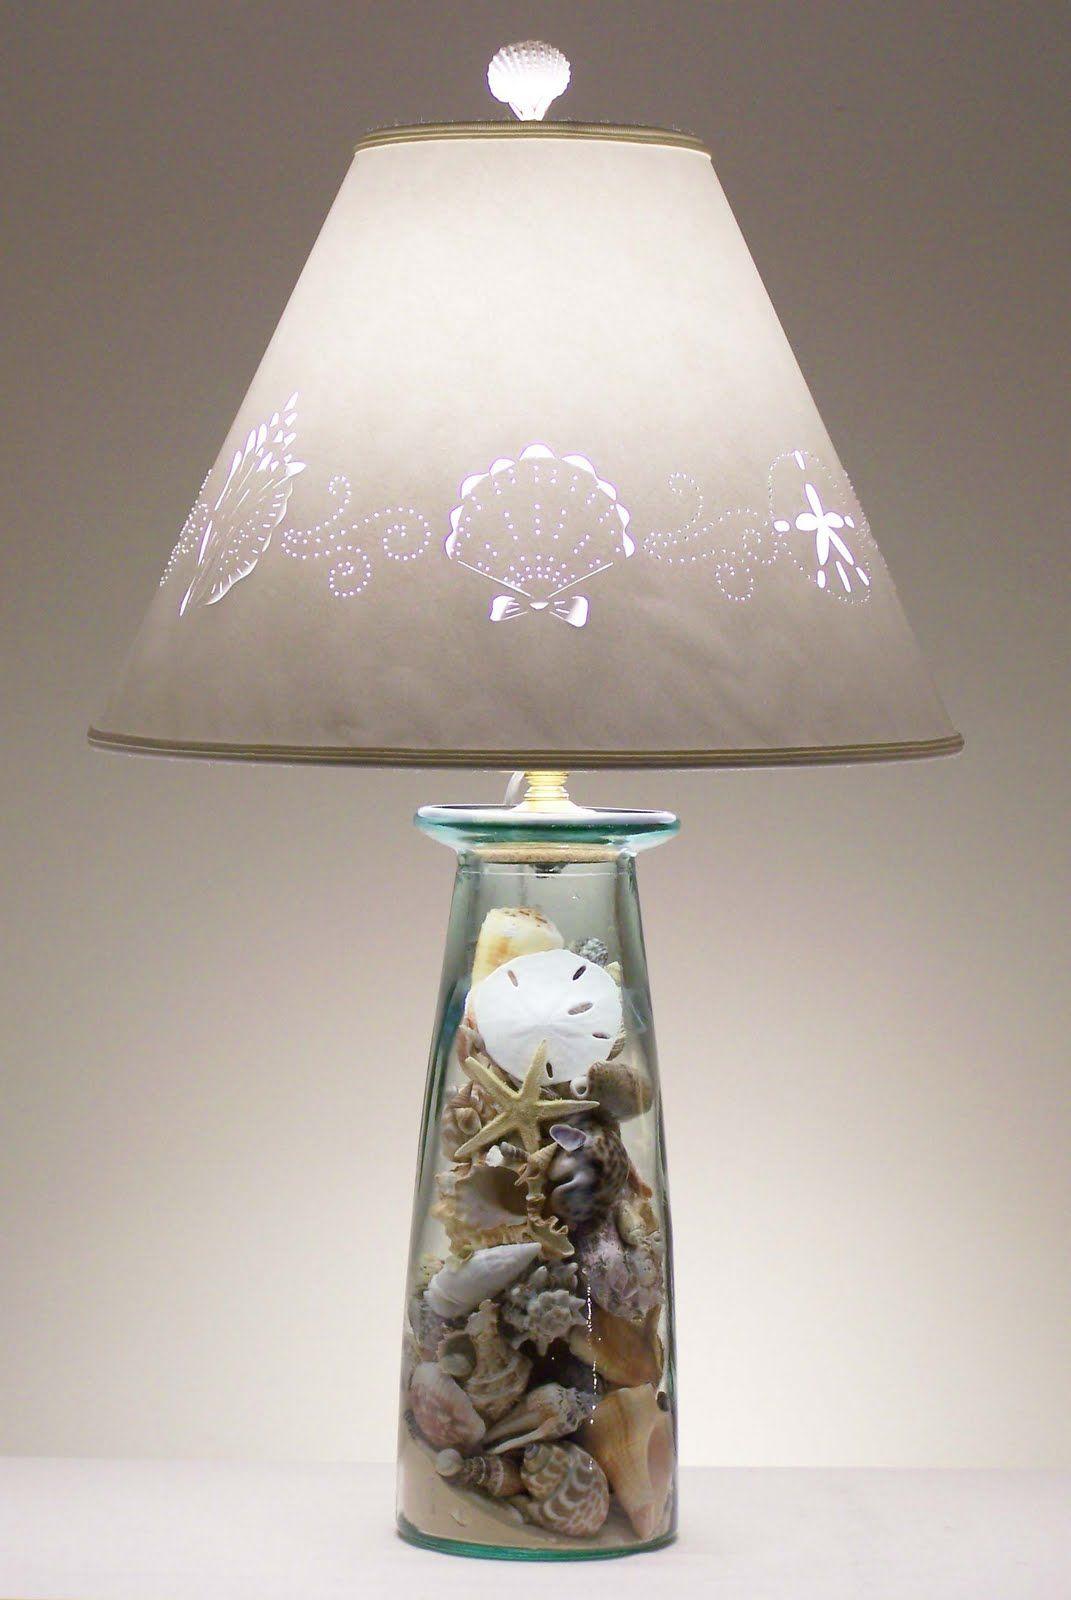 How to Make a Seashell Lamp Seashells lamp, Beach themed